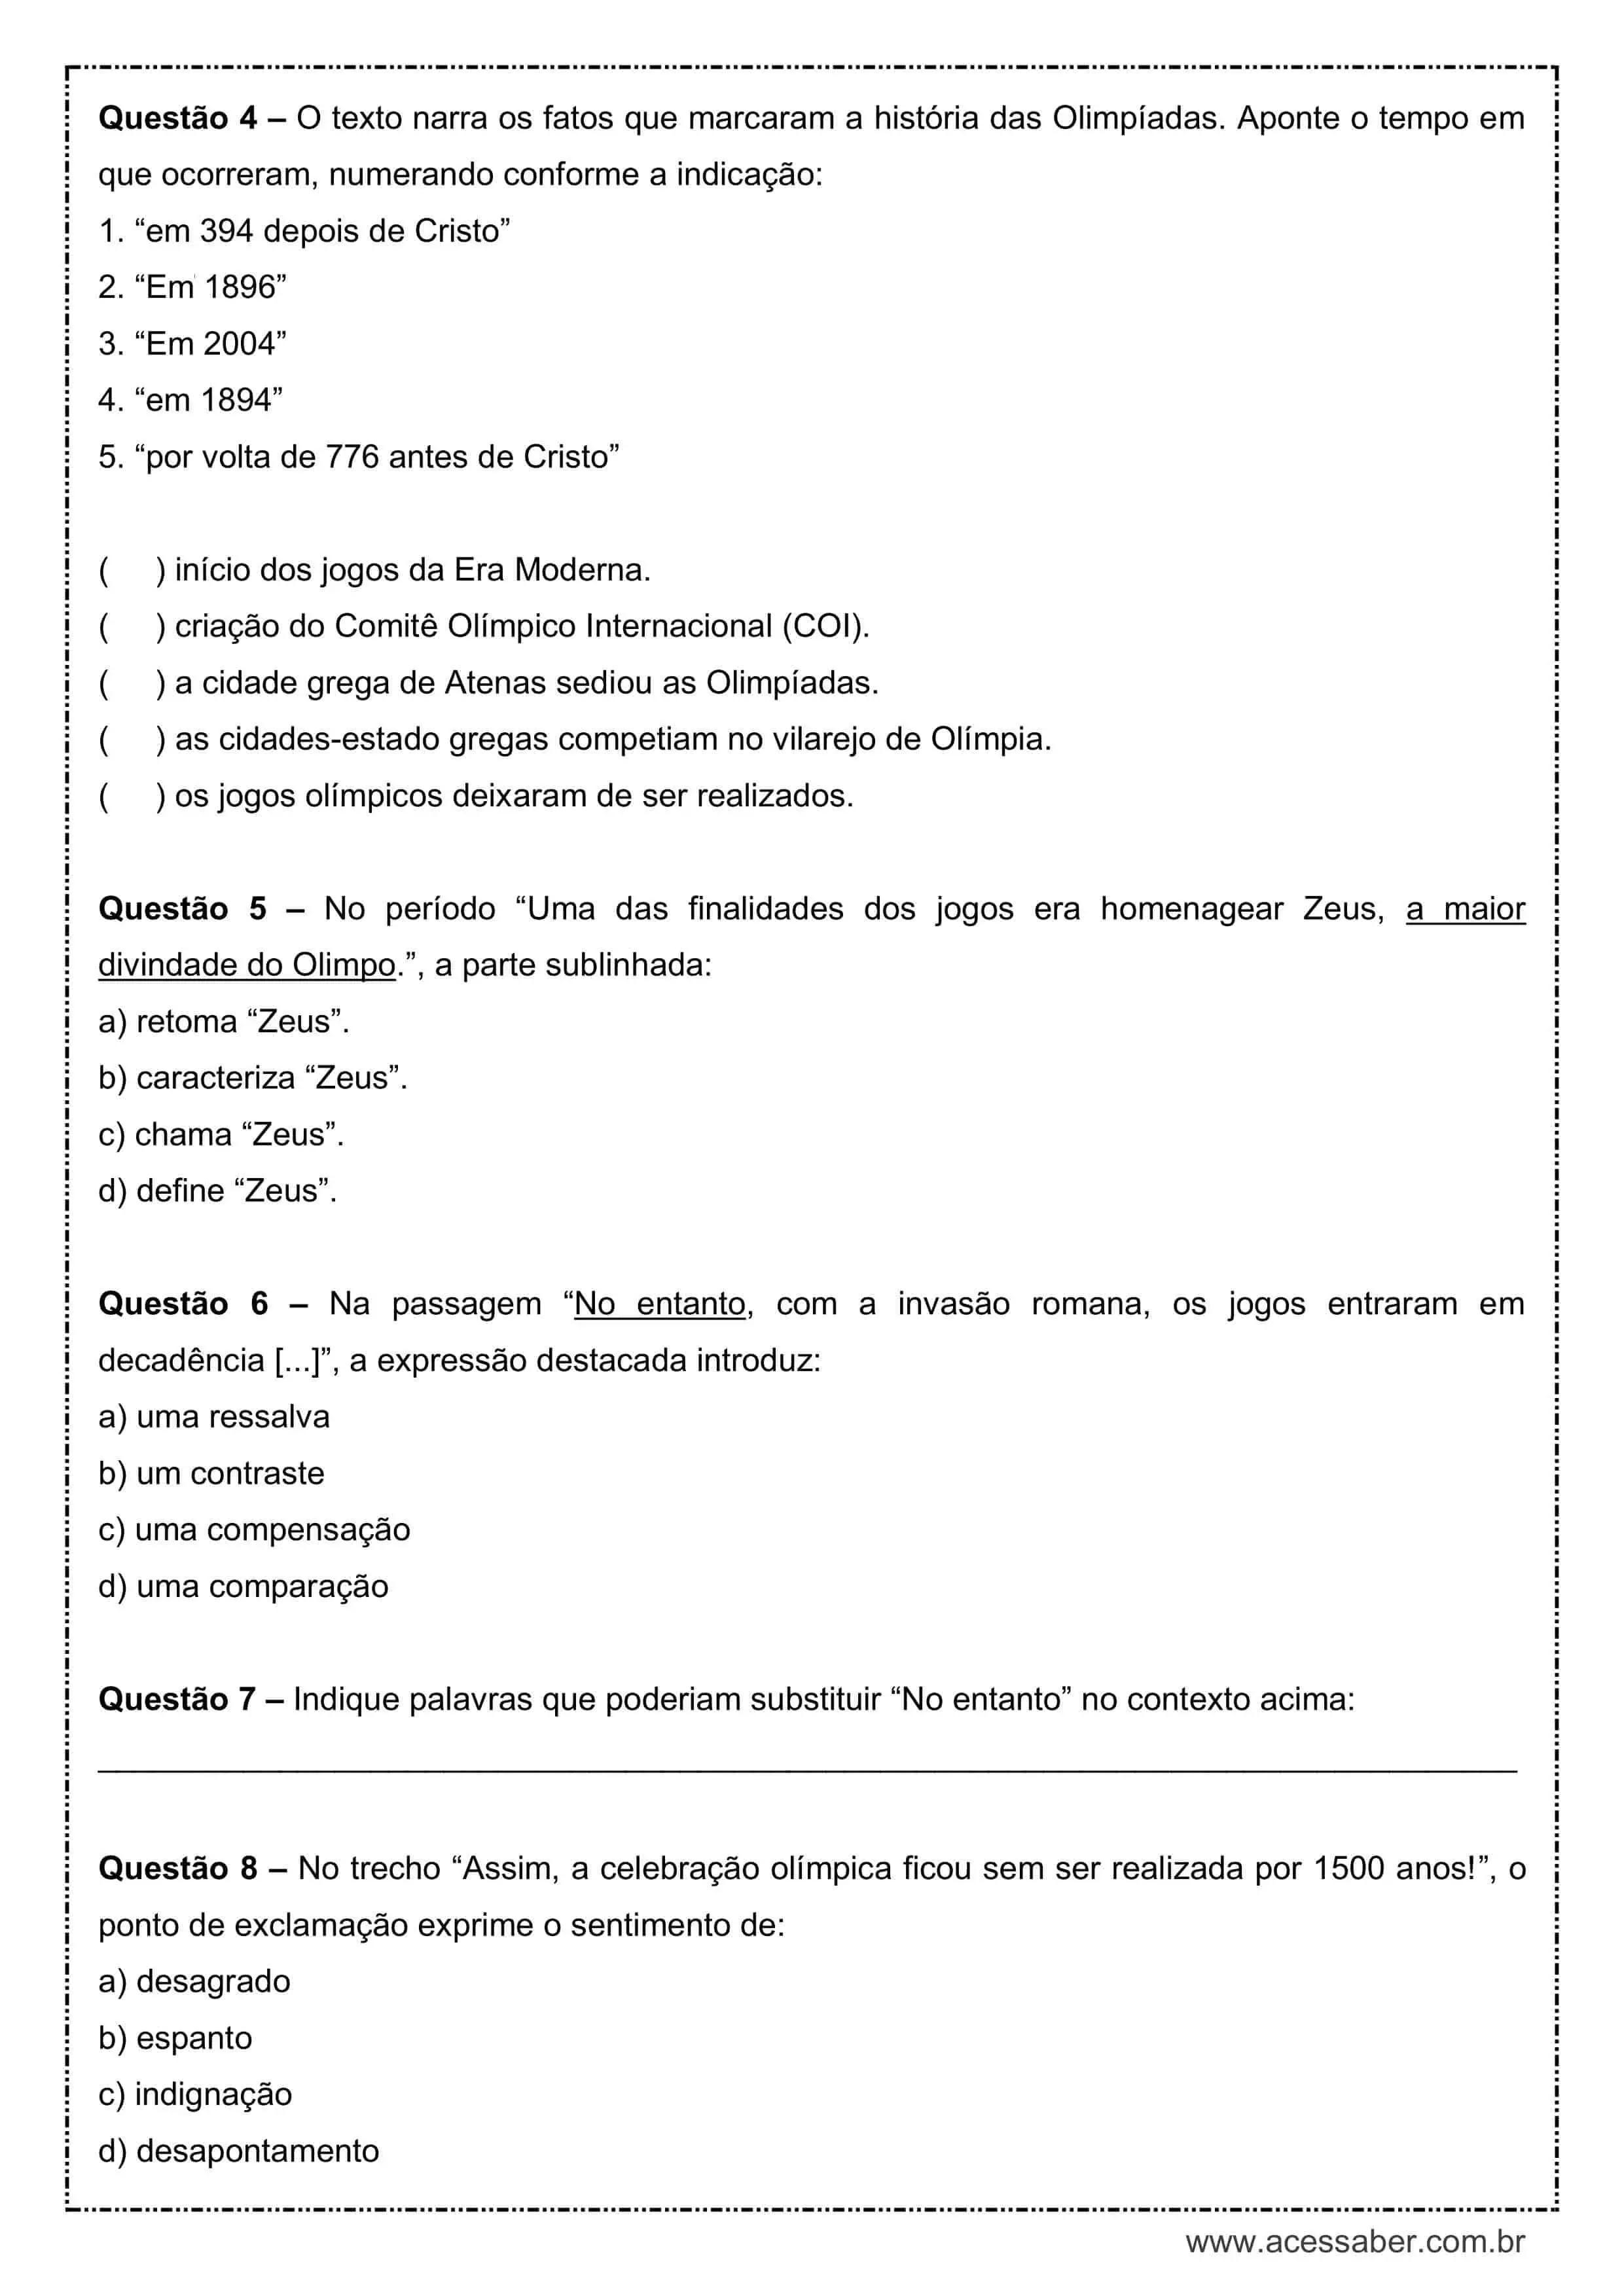 Interpretacao De Texto Historia Das Olimpiadas 6º Ano Acessaber